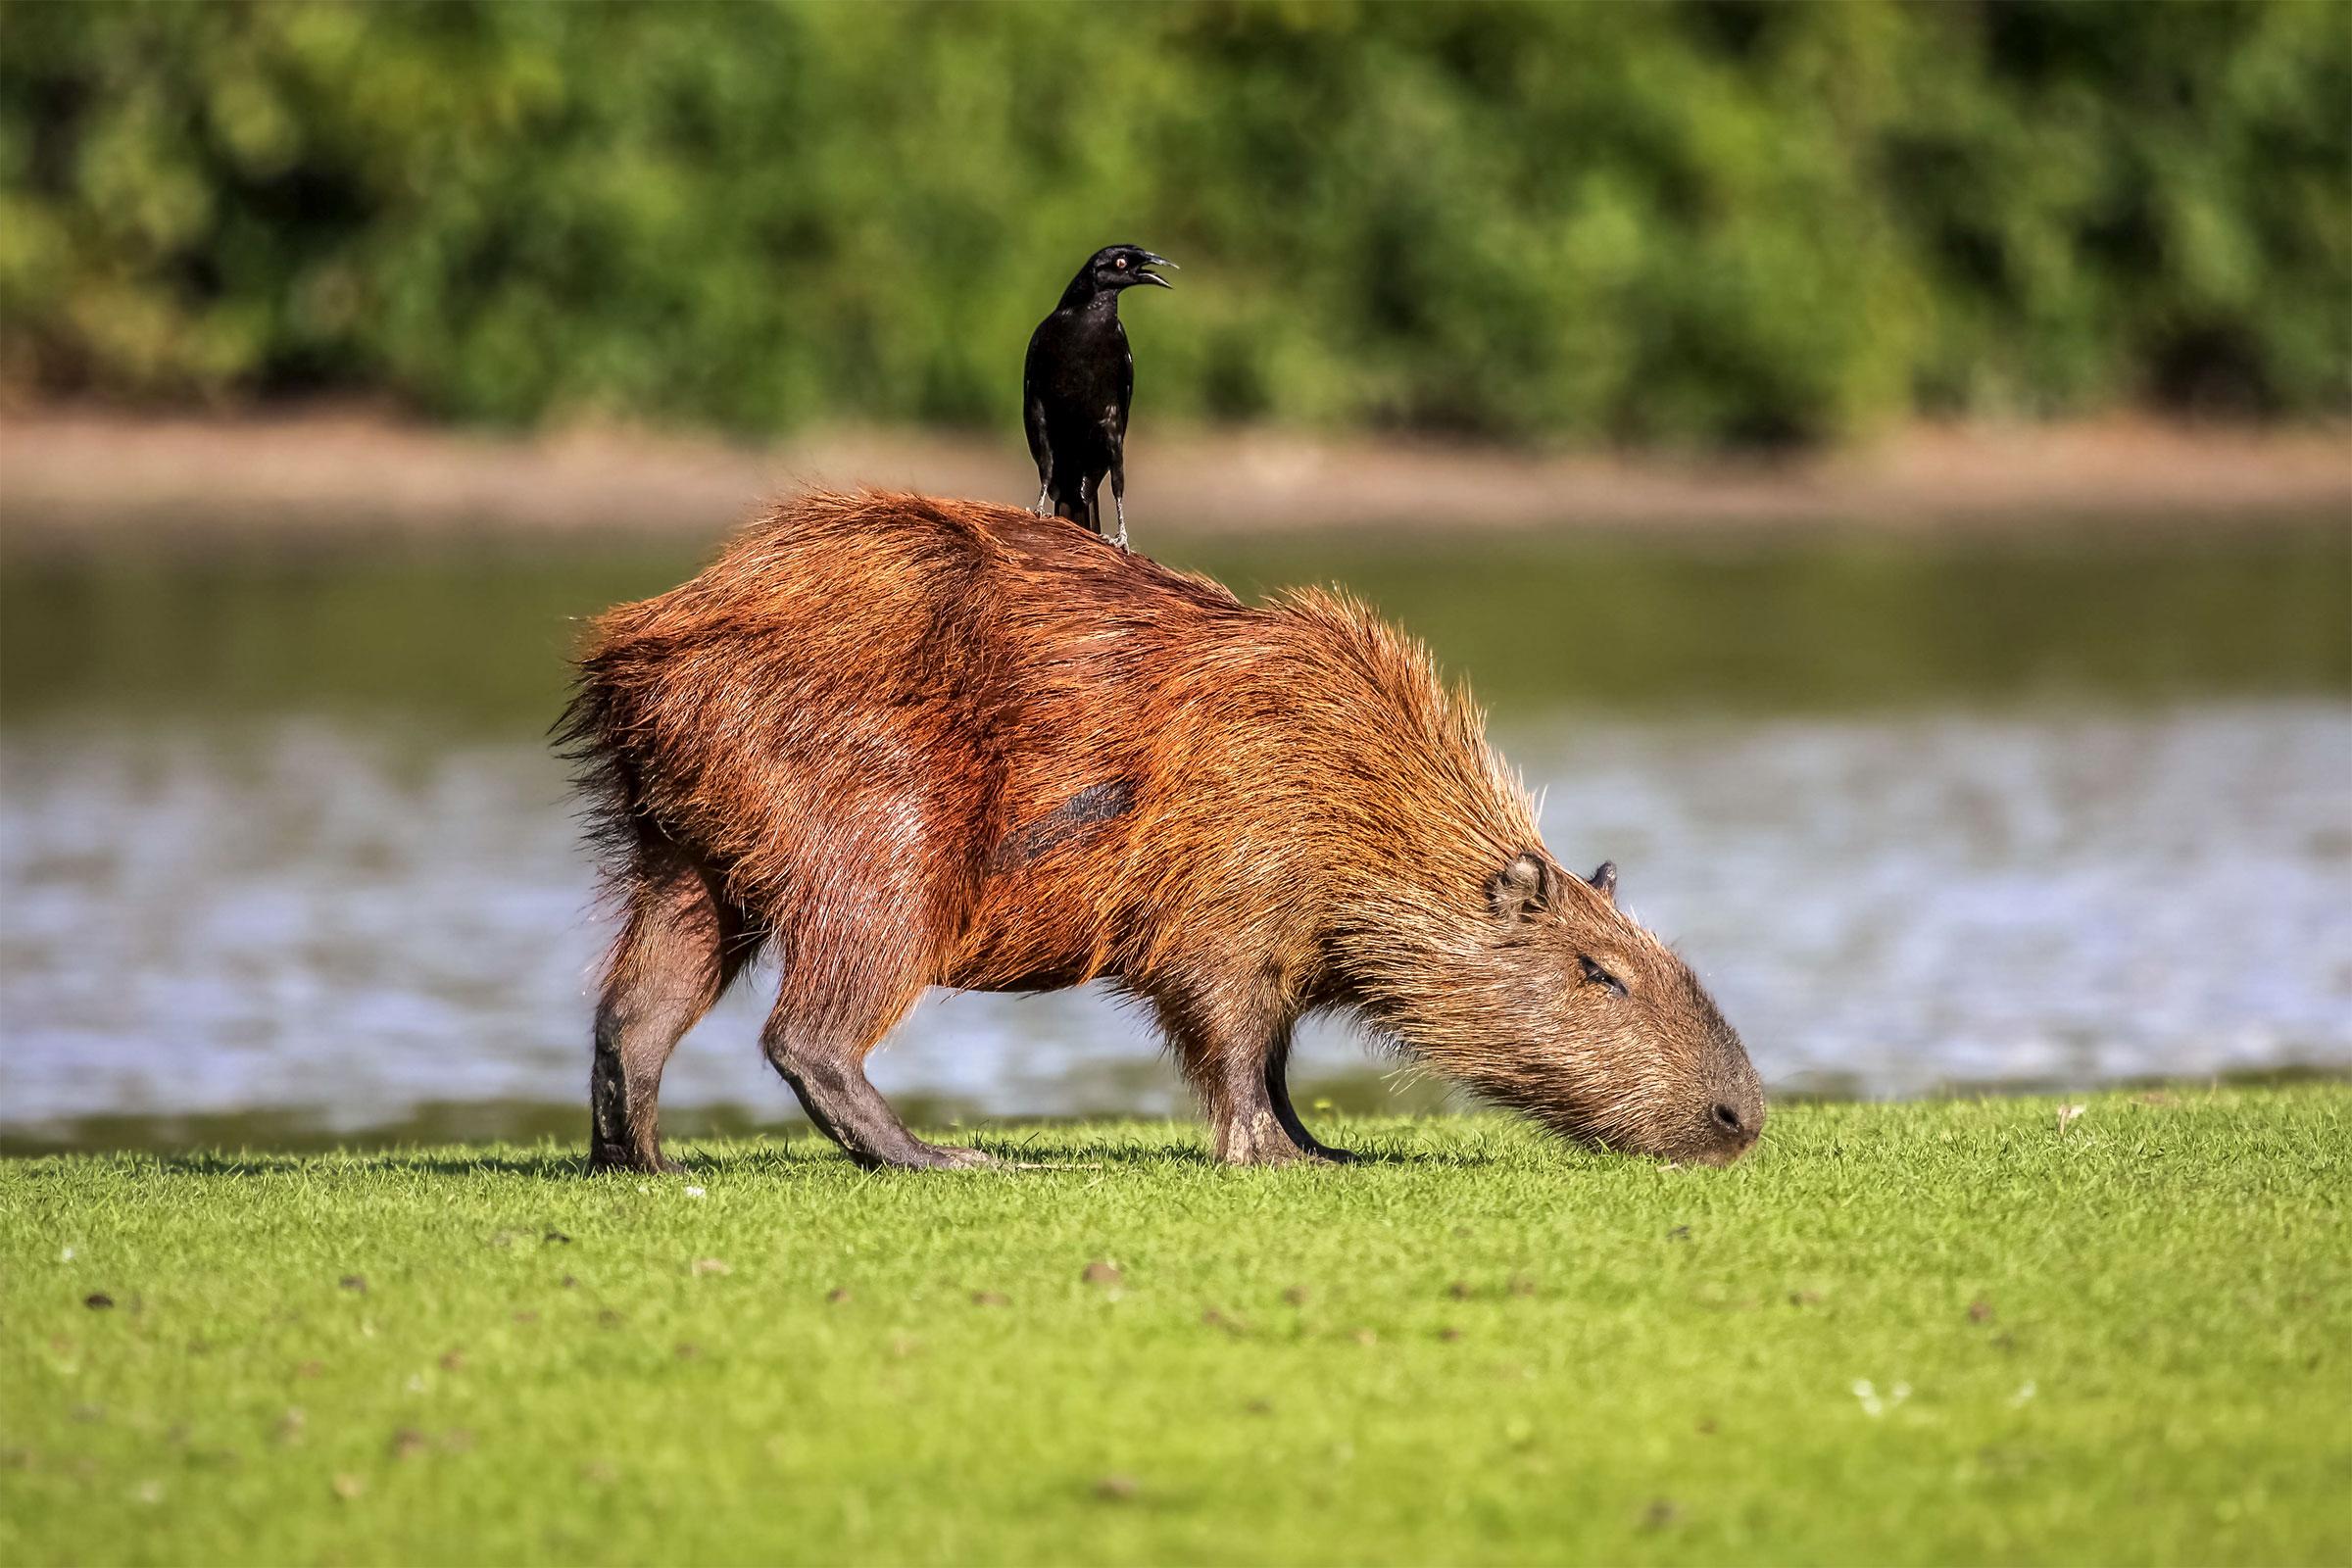 Giant Cowbird and Capybara.Photo:Uwe Bergwitz/Alamy